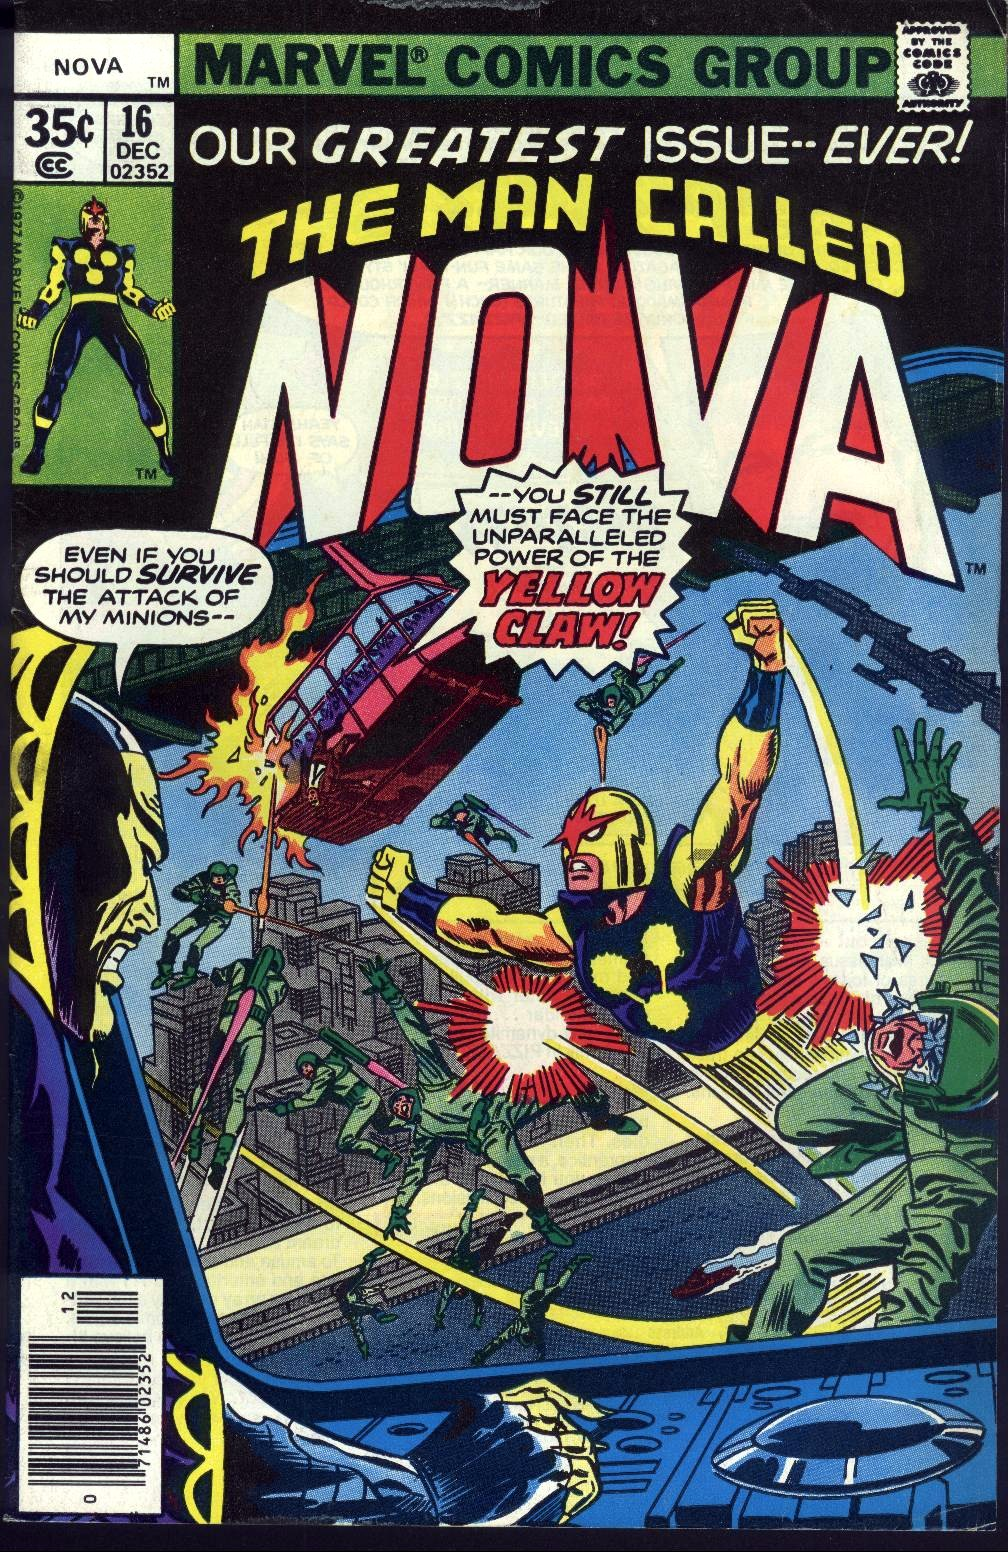 Nova (1976) 16 Page 1